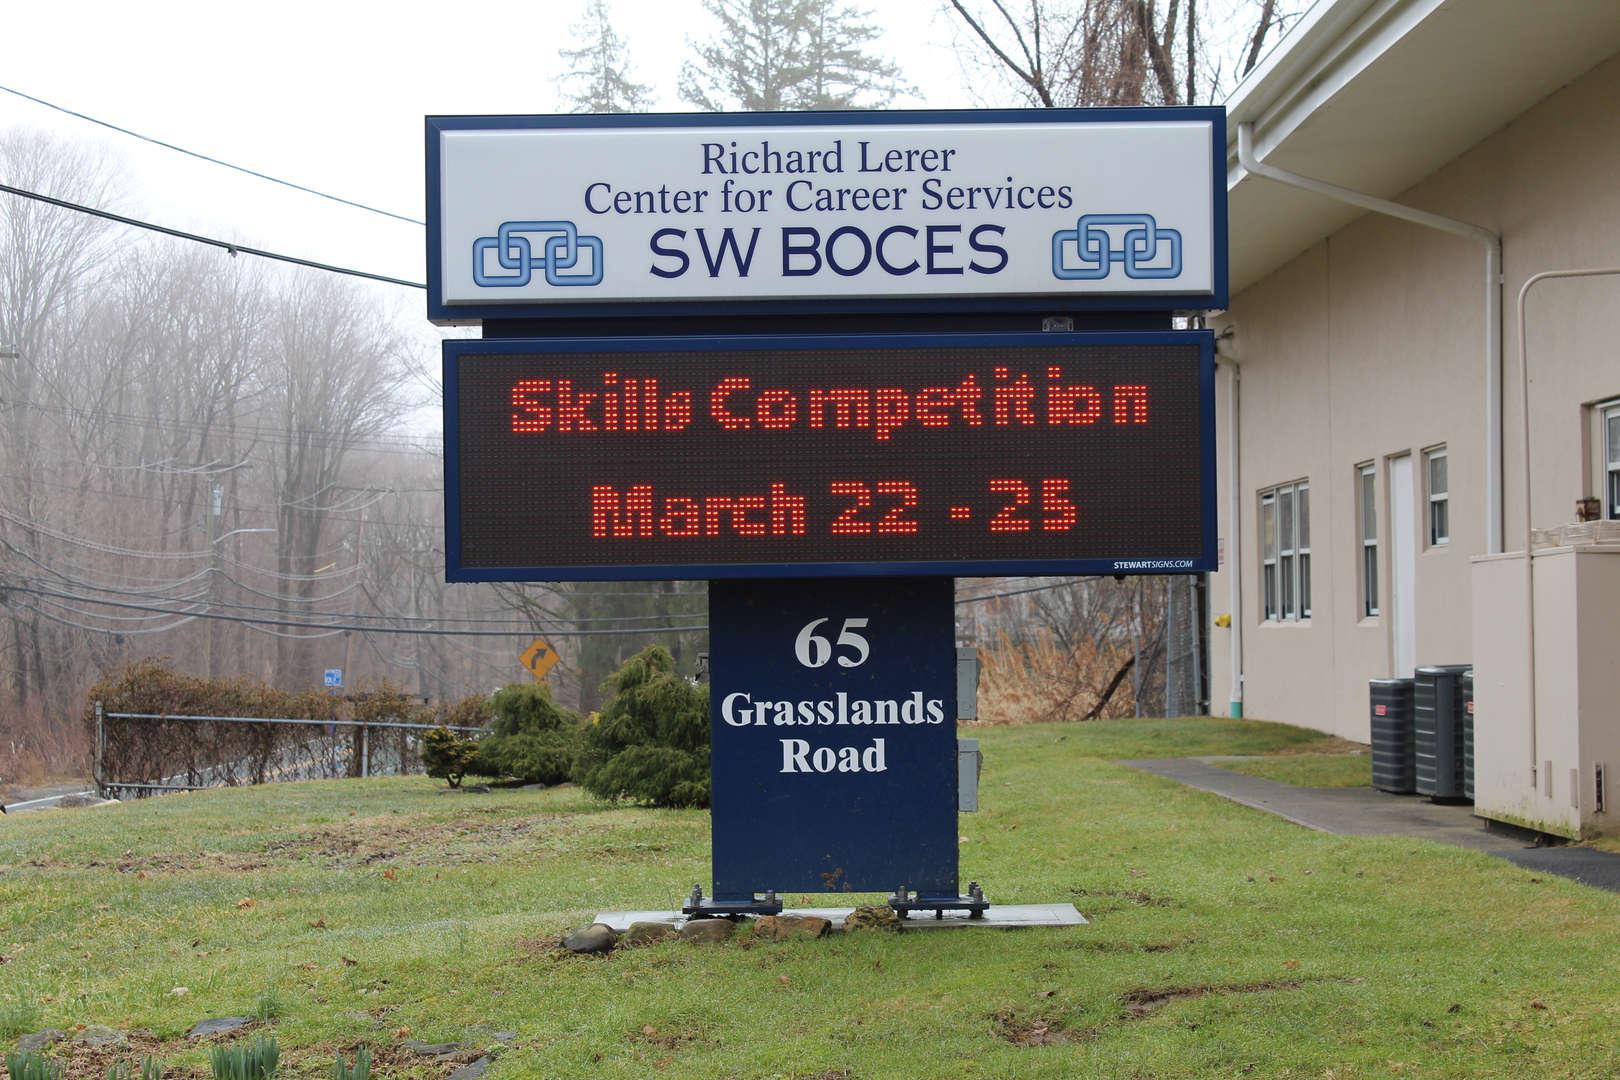 Digital signa ccouncing SkillsuSA is taking place March 22-25